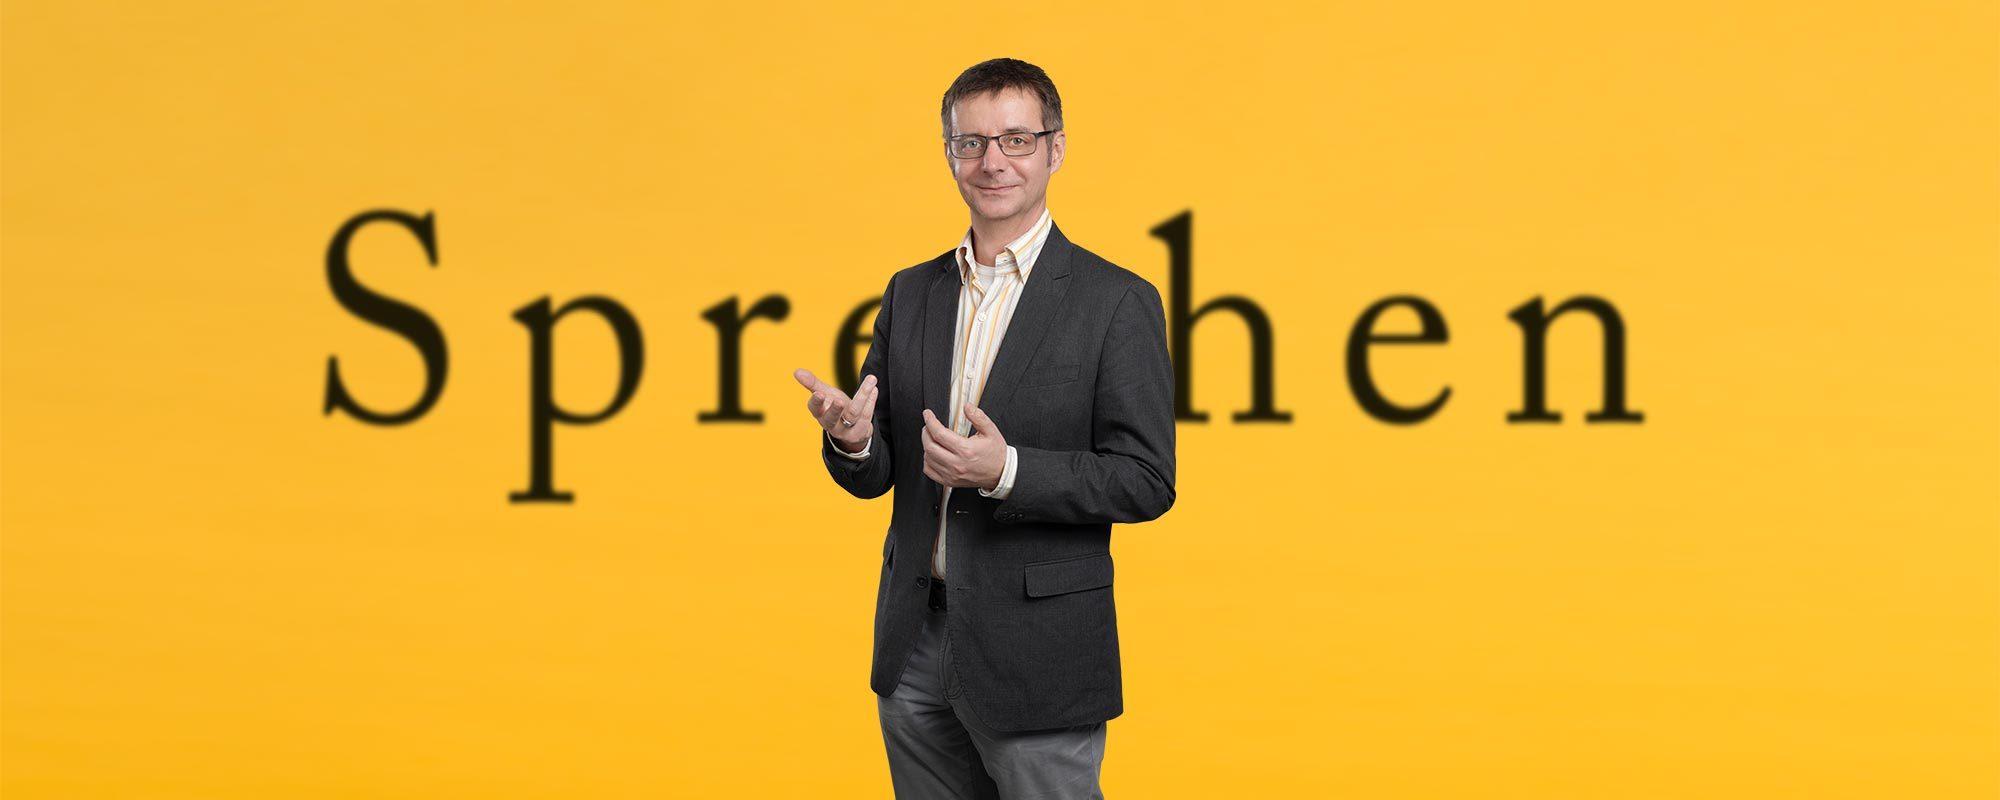 Mag-Martin-Weber-Sprechen-